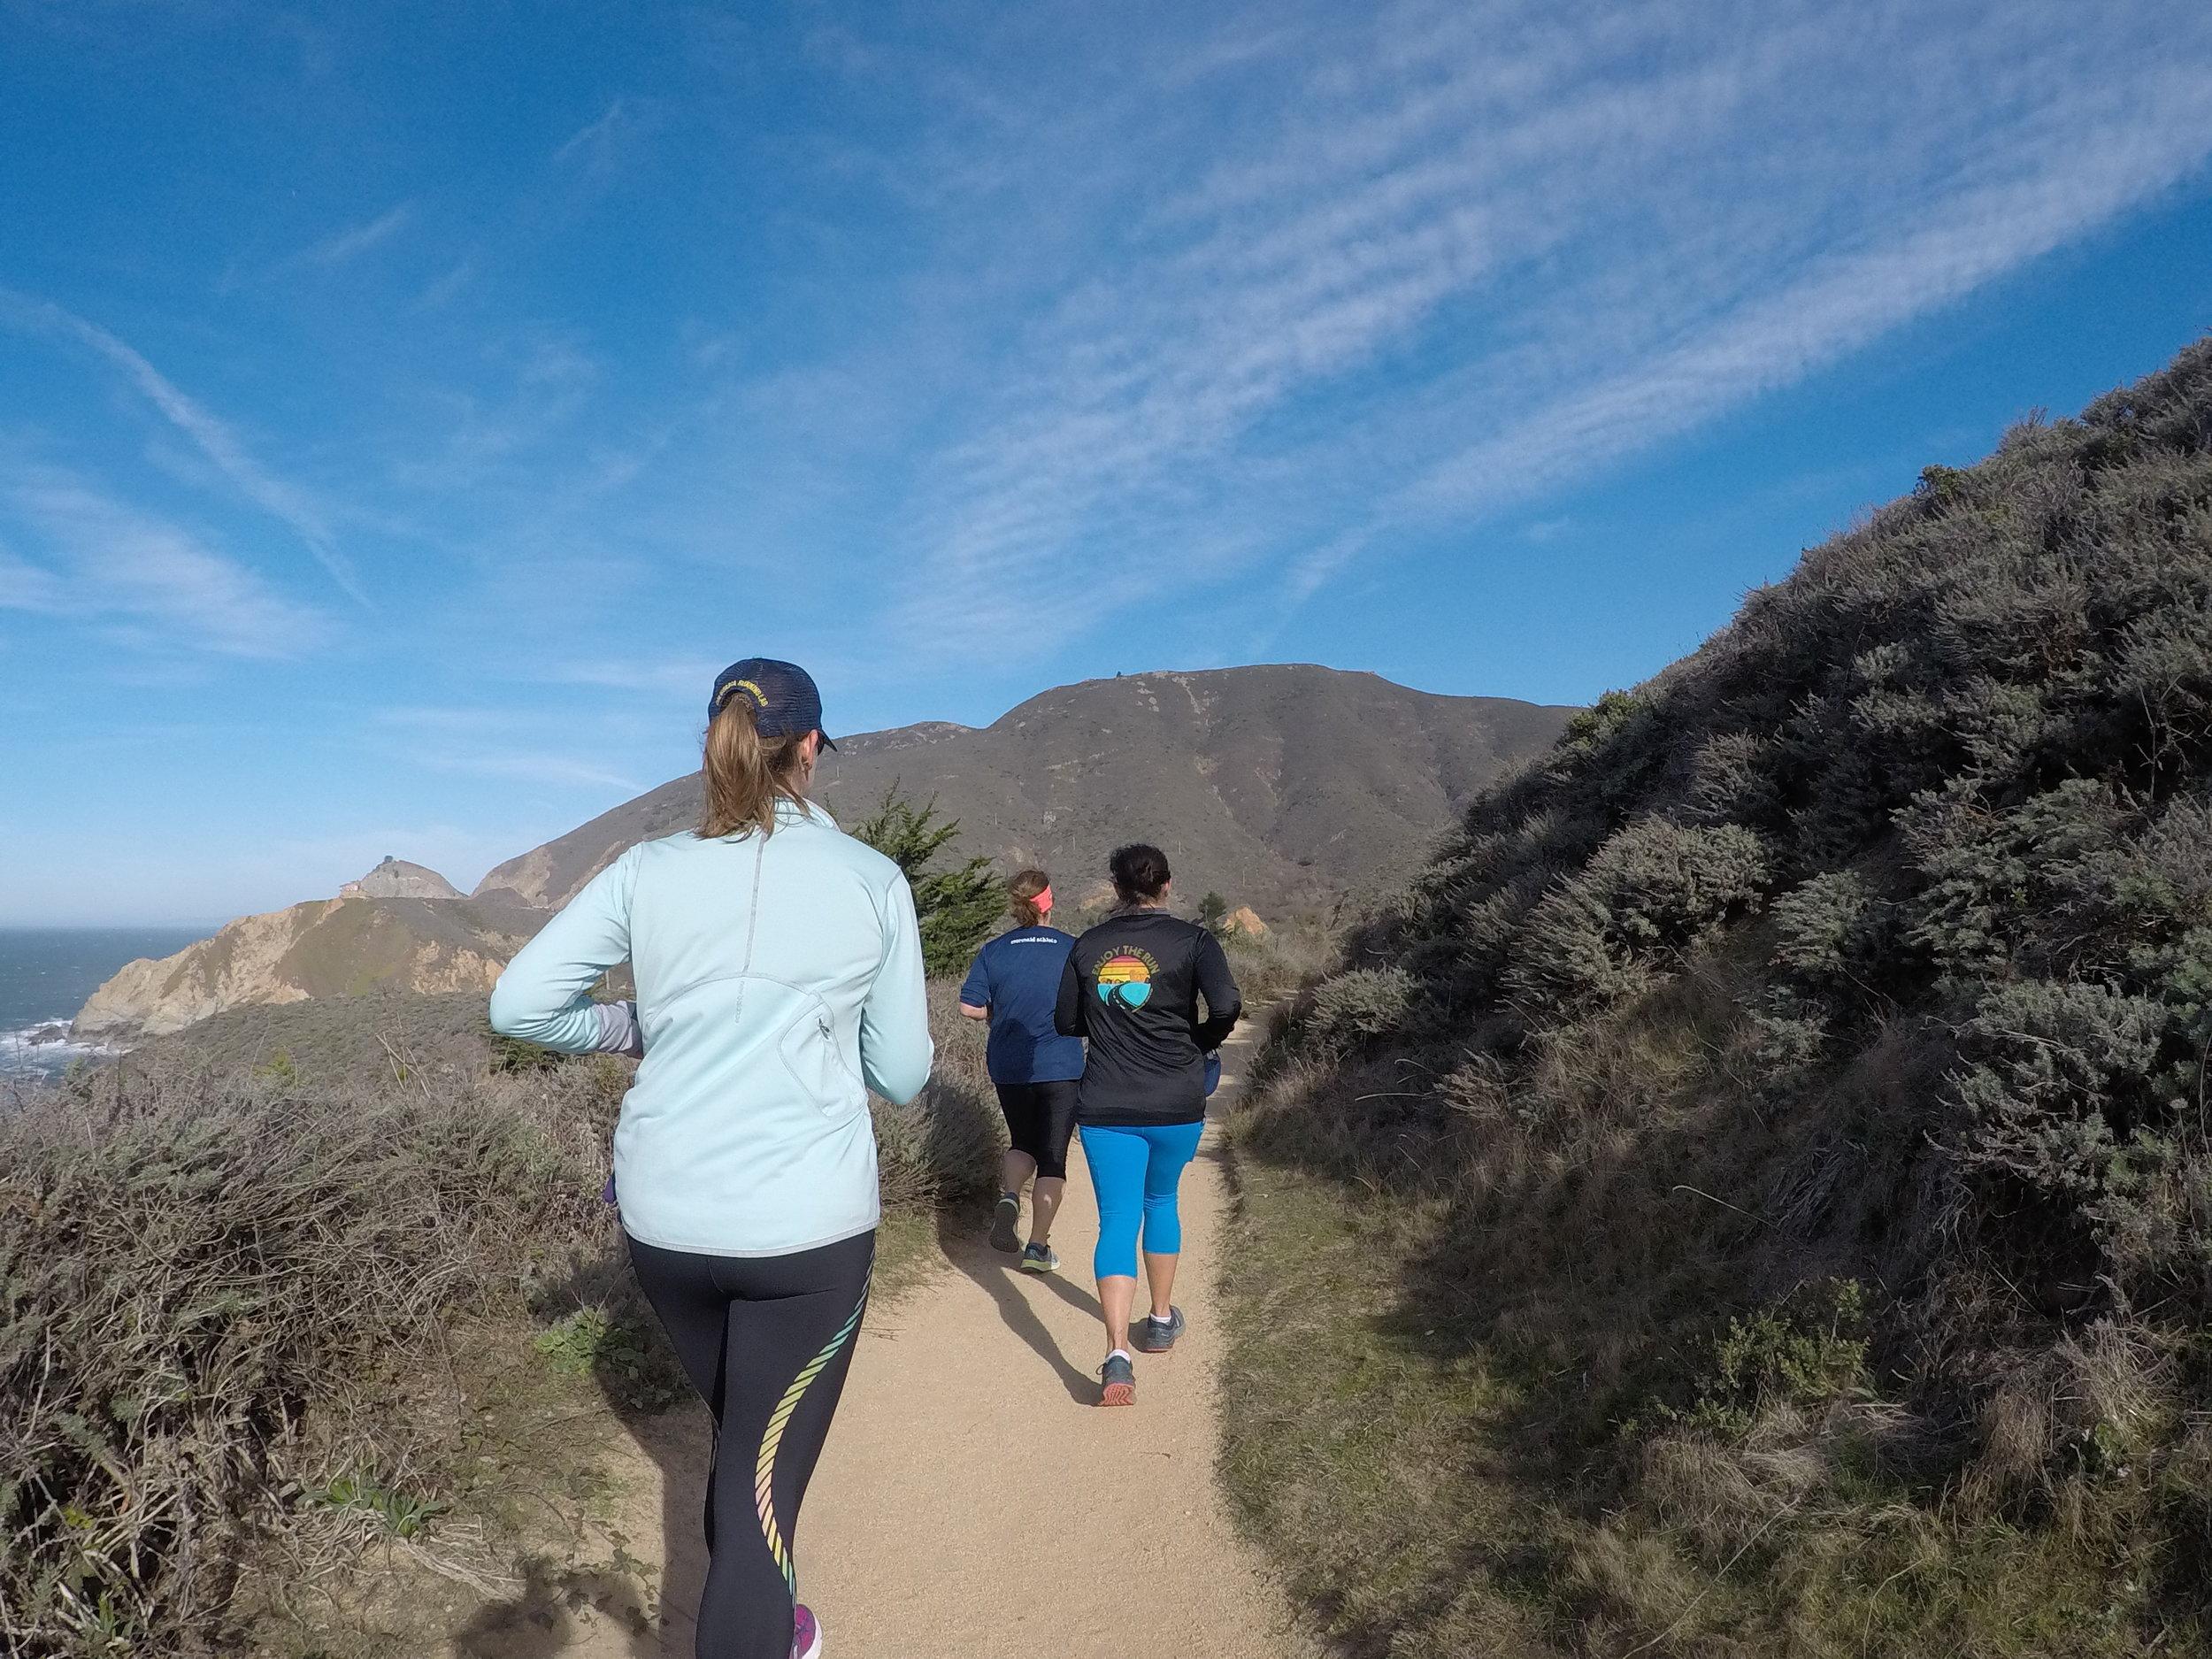 Trail run with amazing ocean views